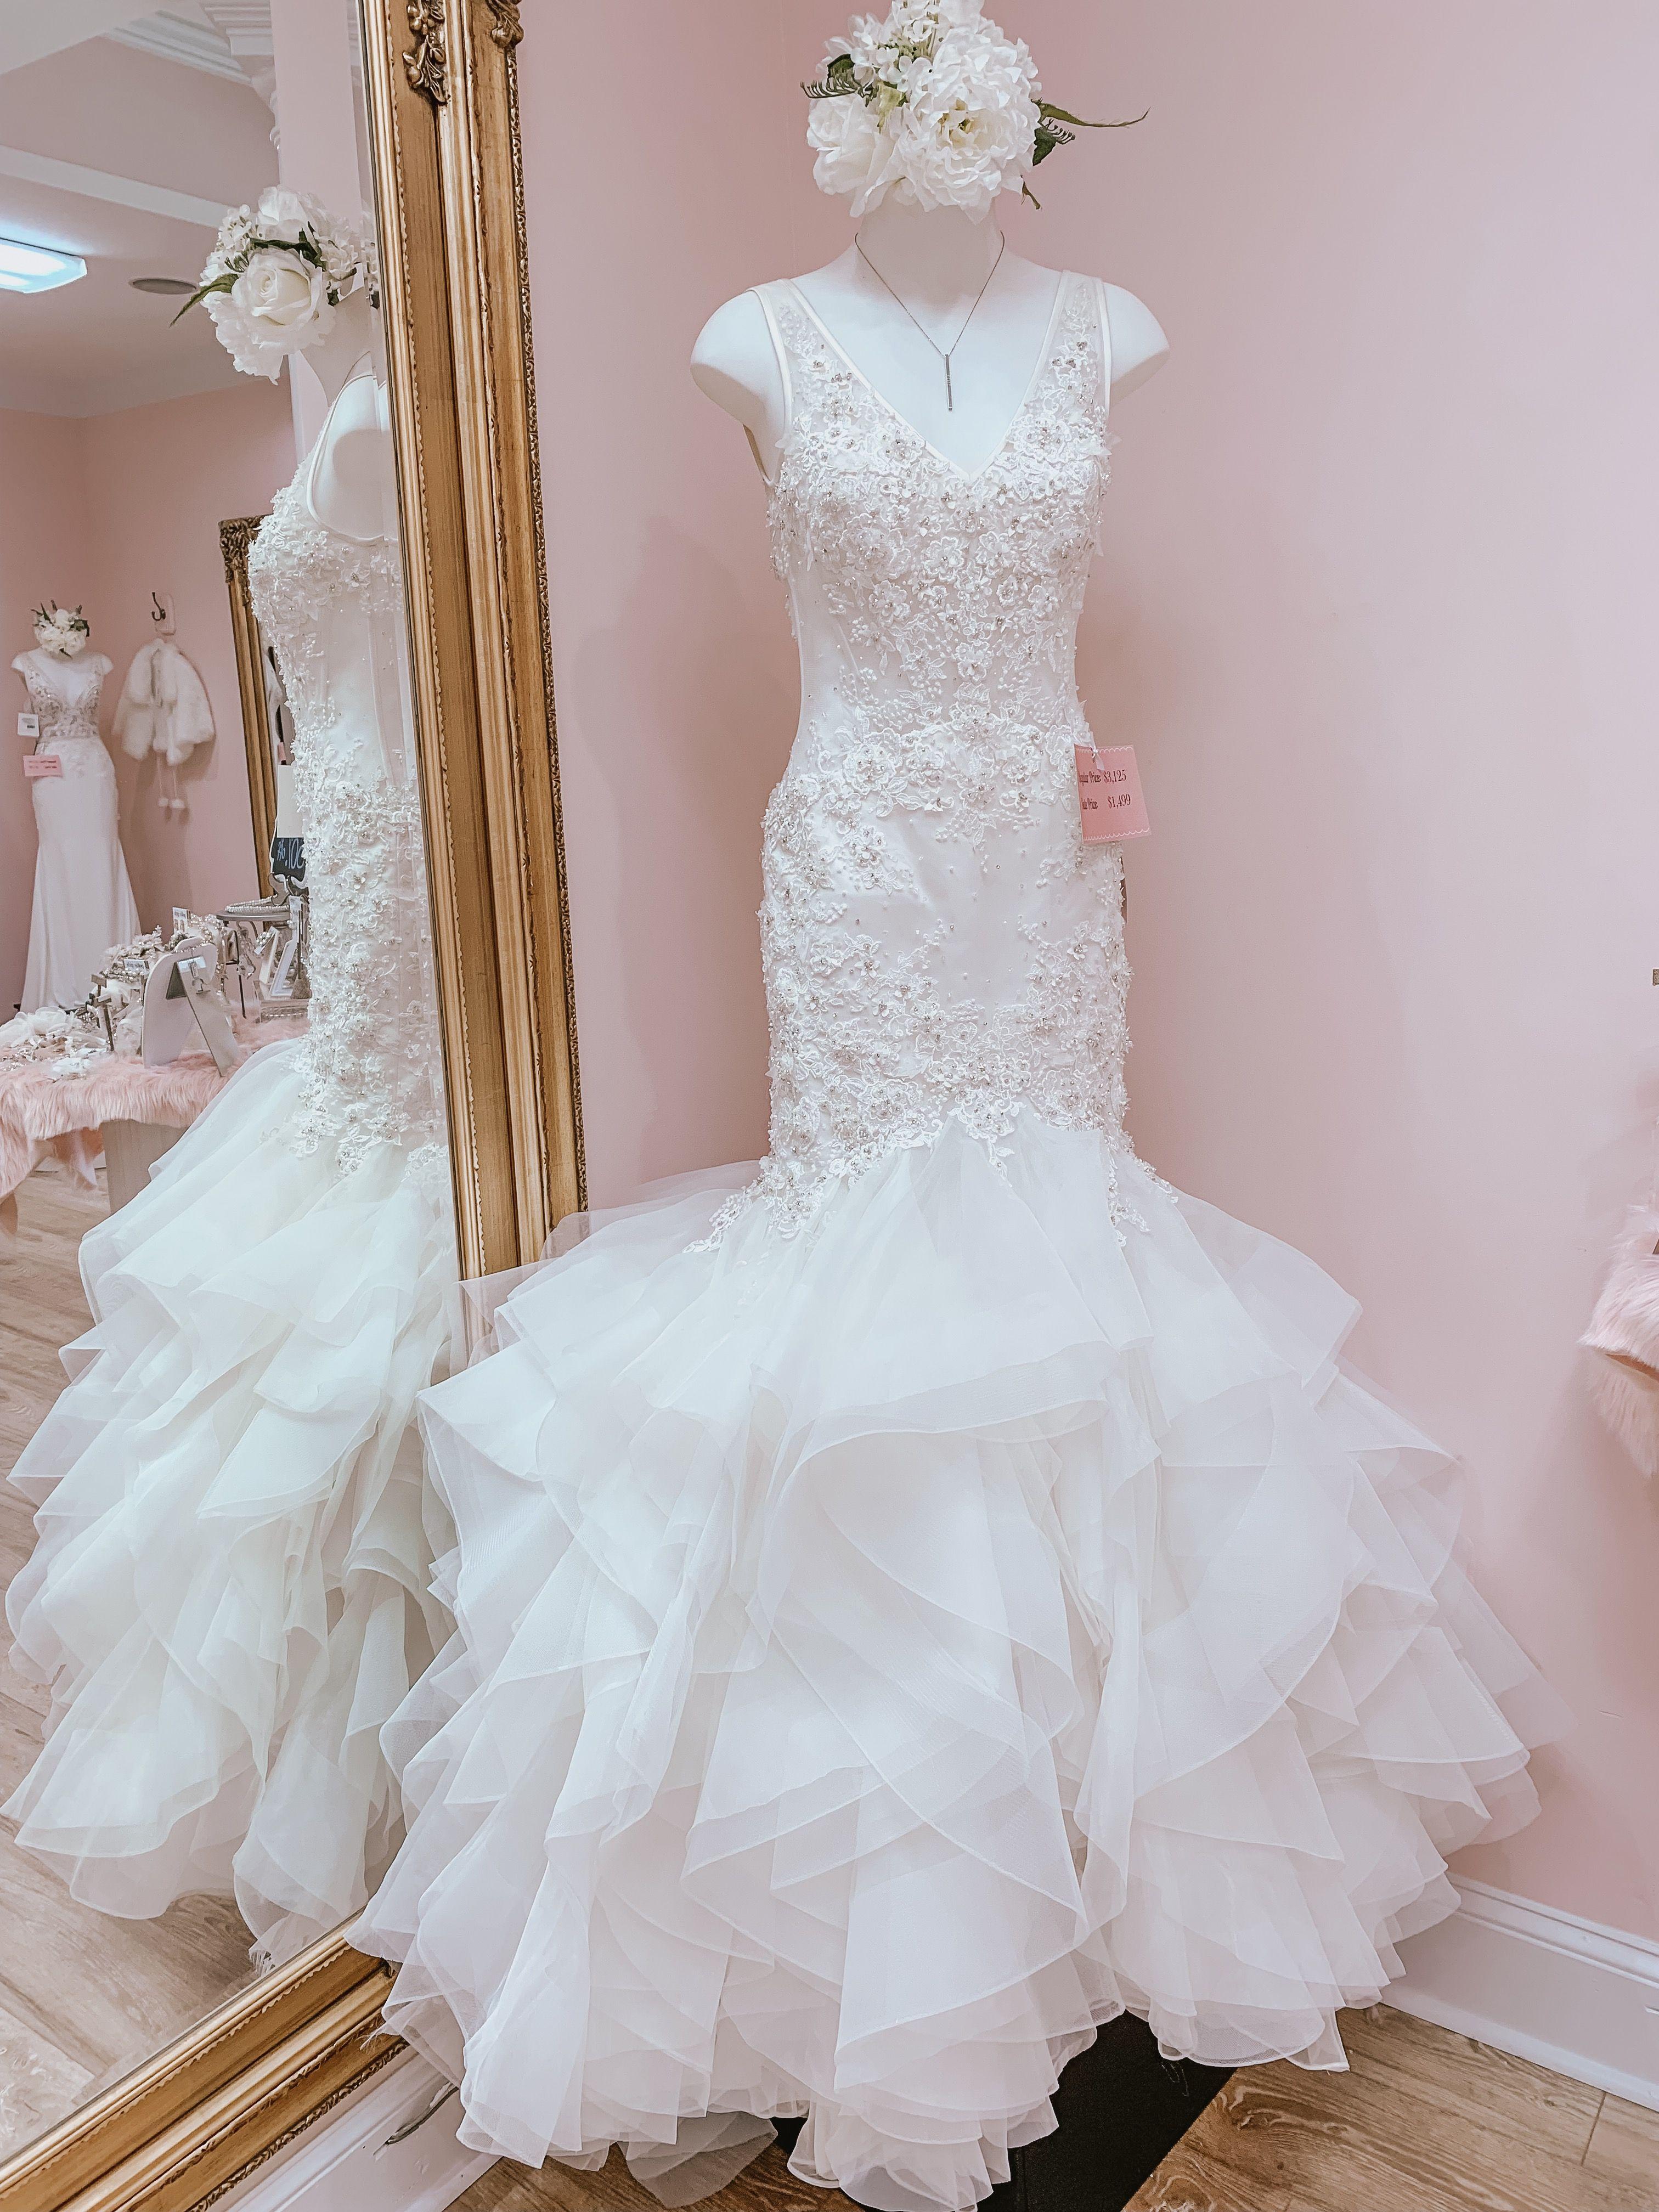 Randy Fenoli Charlize Wedding Dresses Mermaid Wedding Dress Dresses [ 4032 x 3024 Pixel ]